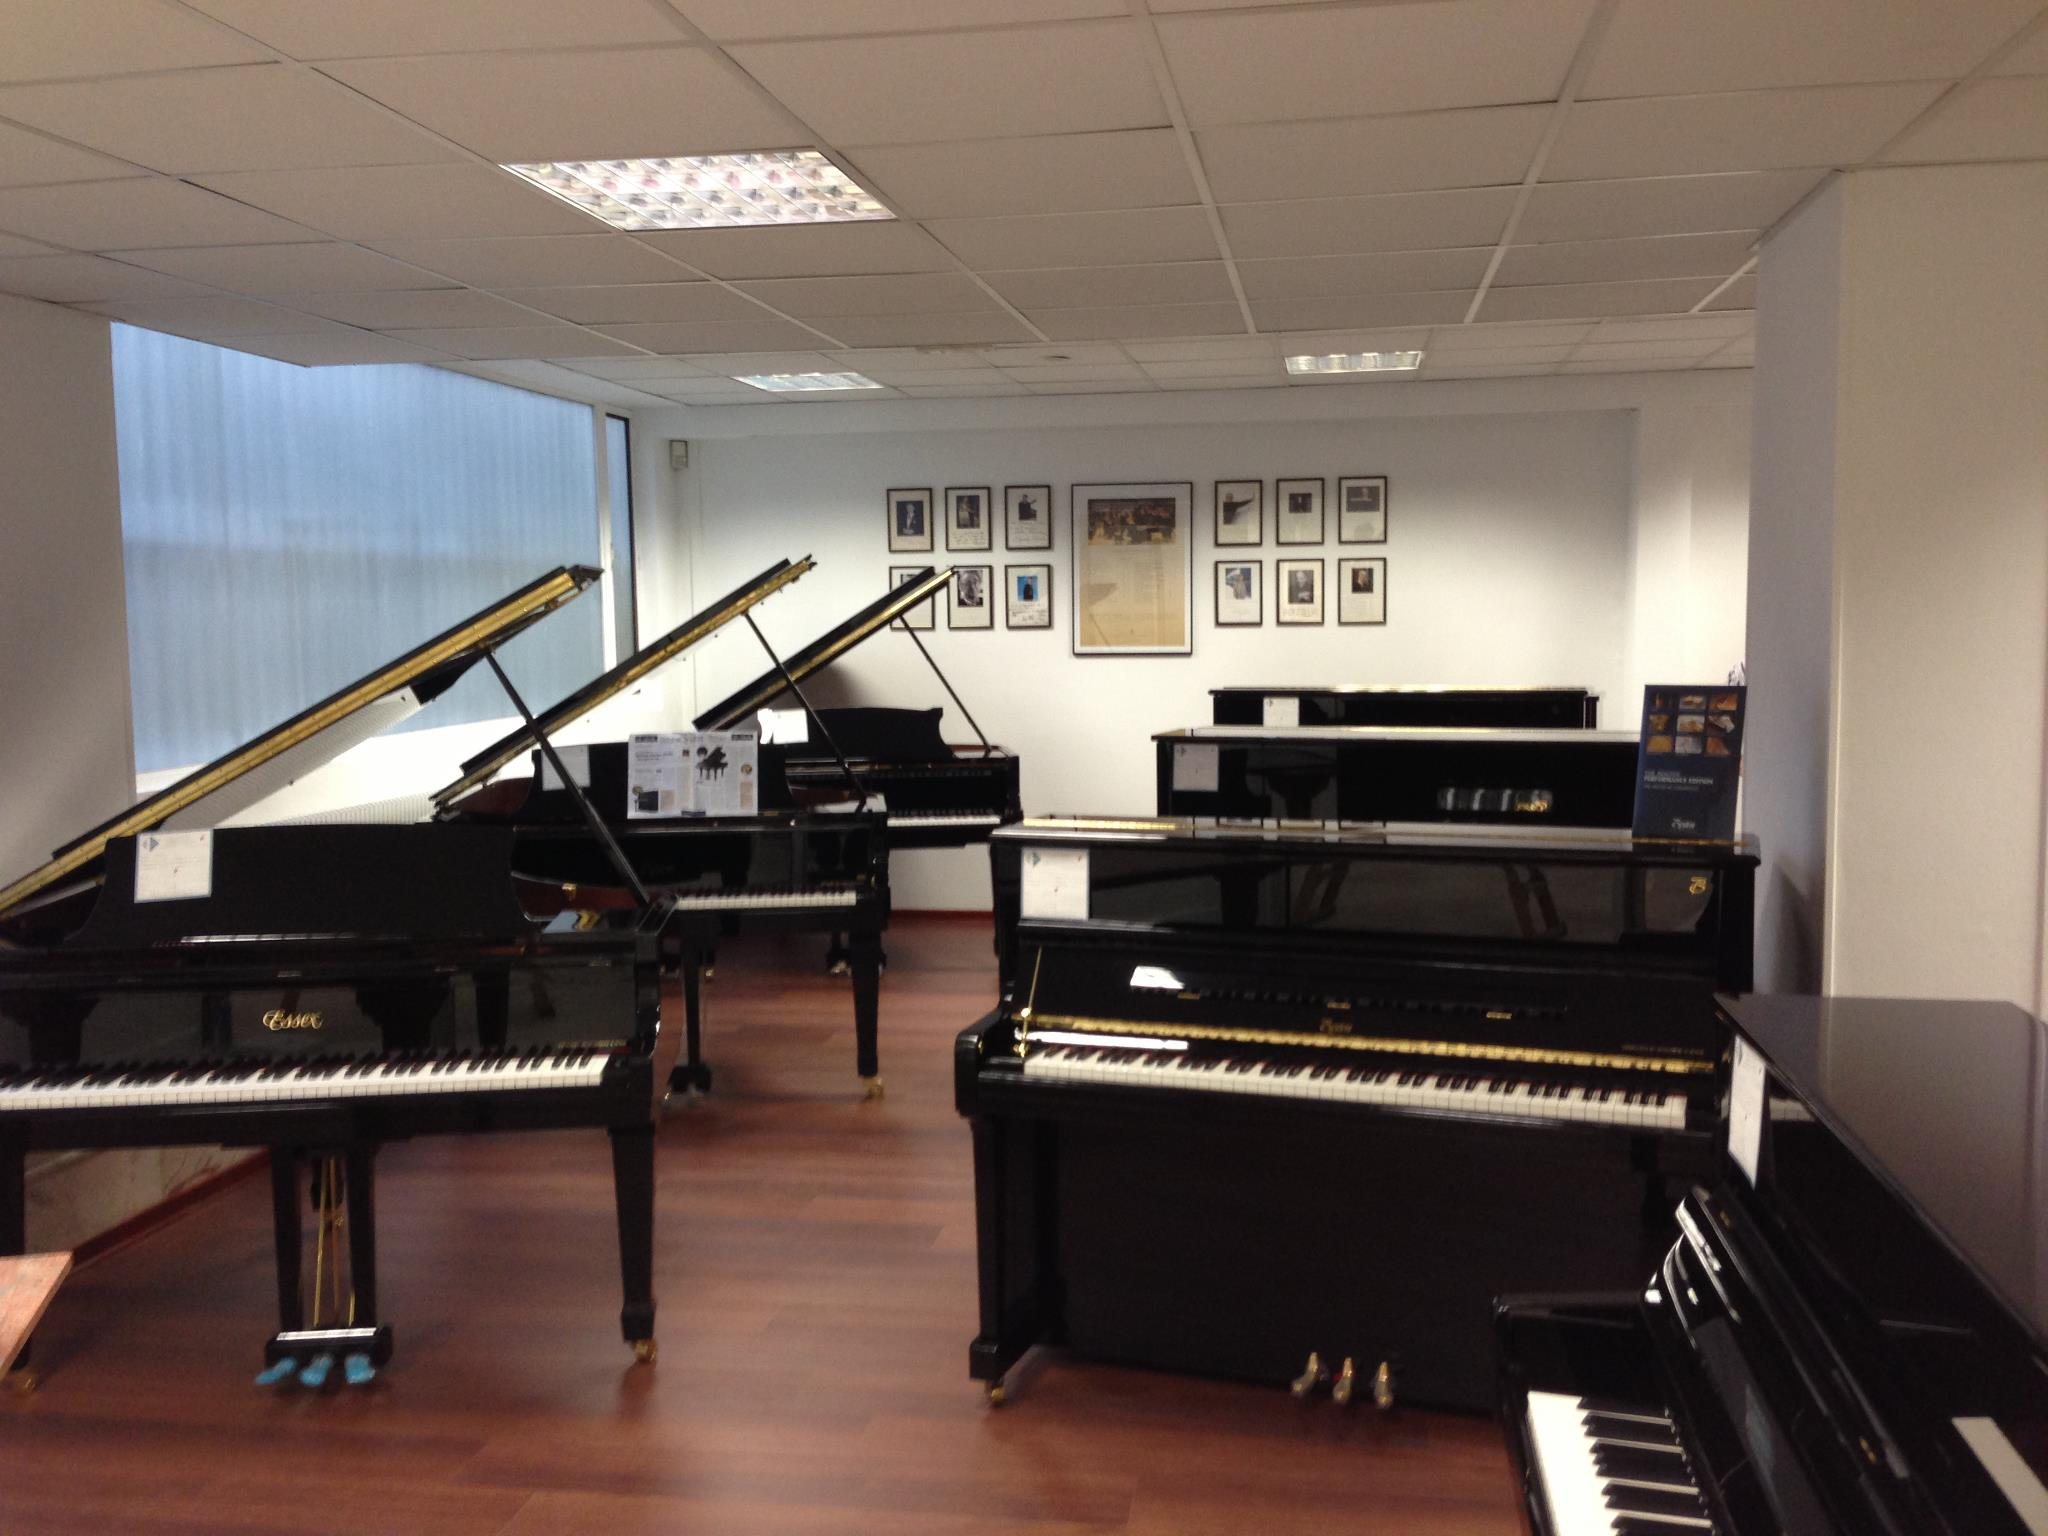 magasin instruments de musique perpignan delmas musique. Black Bedroom Furniture Sets. Home Design Ideas